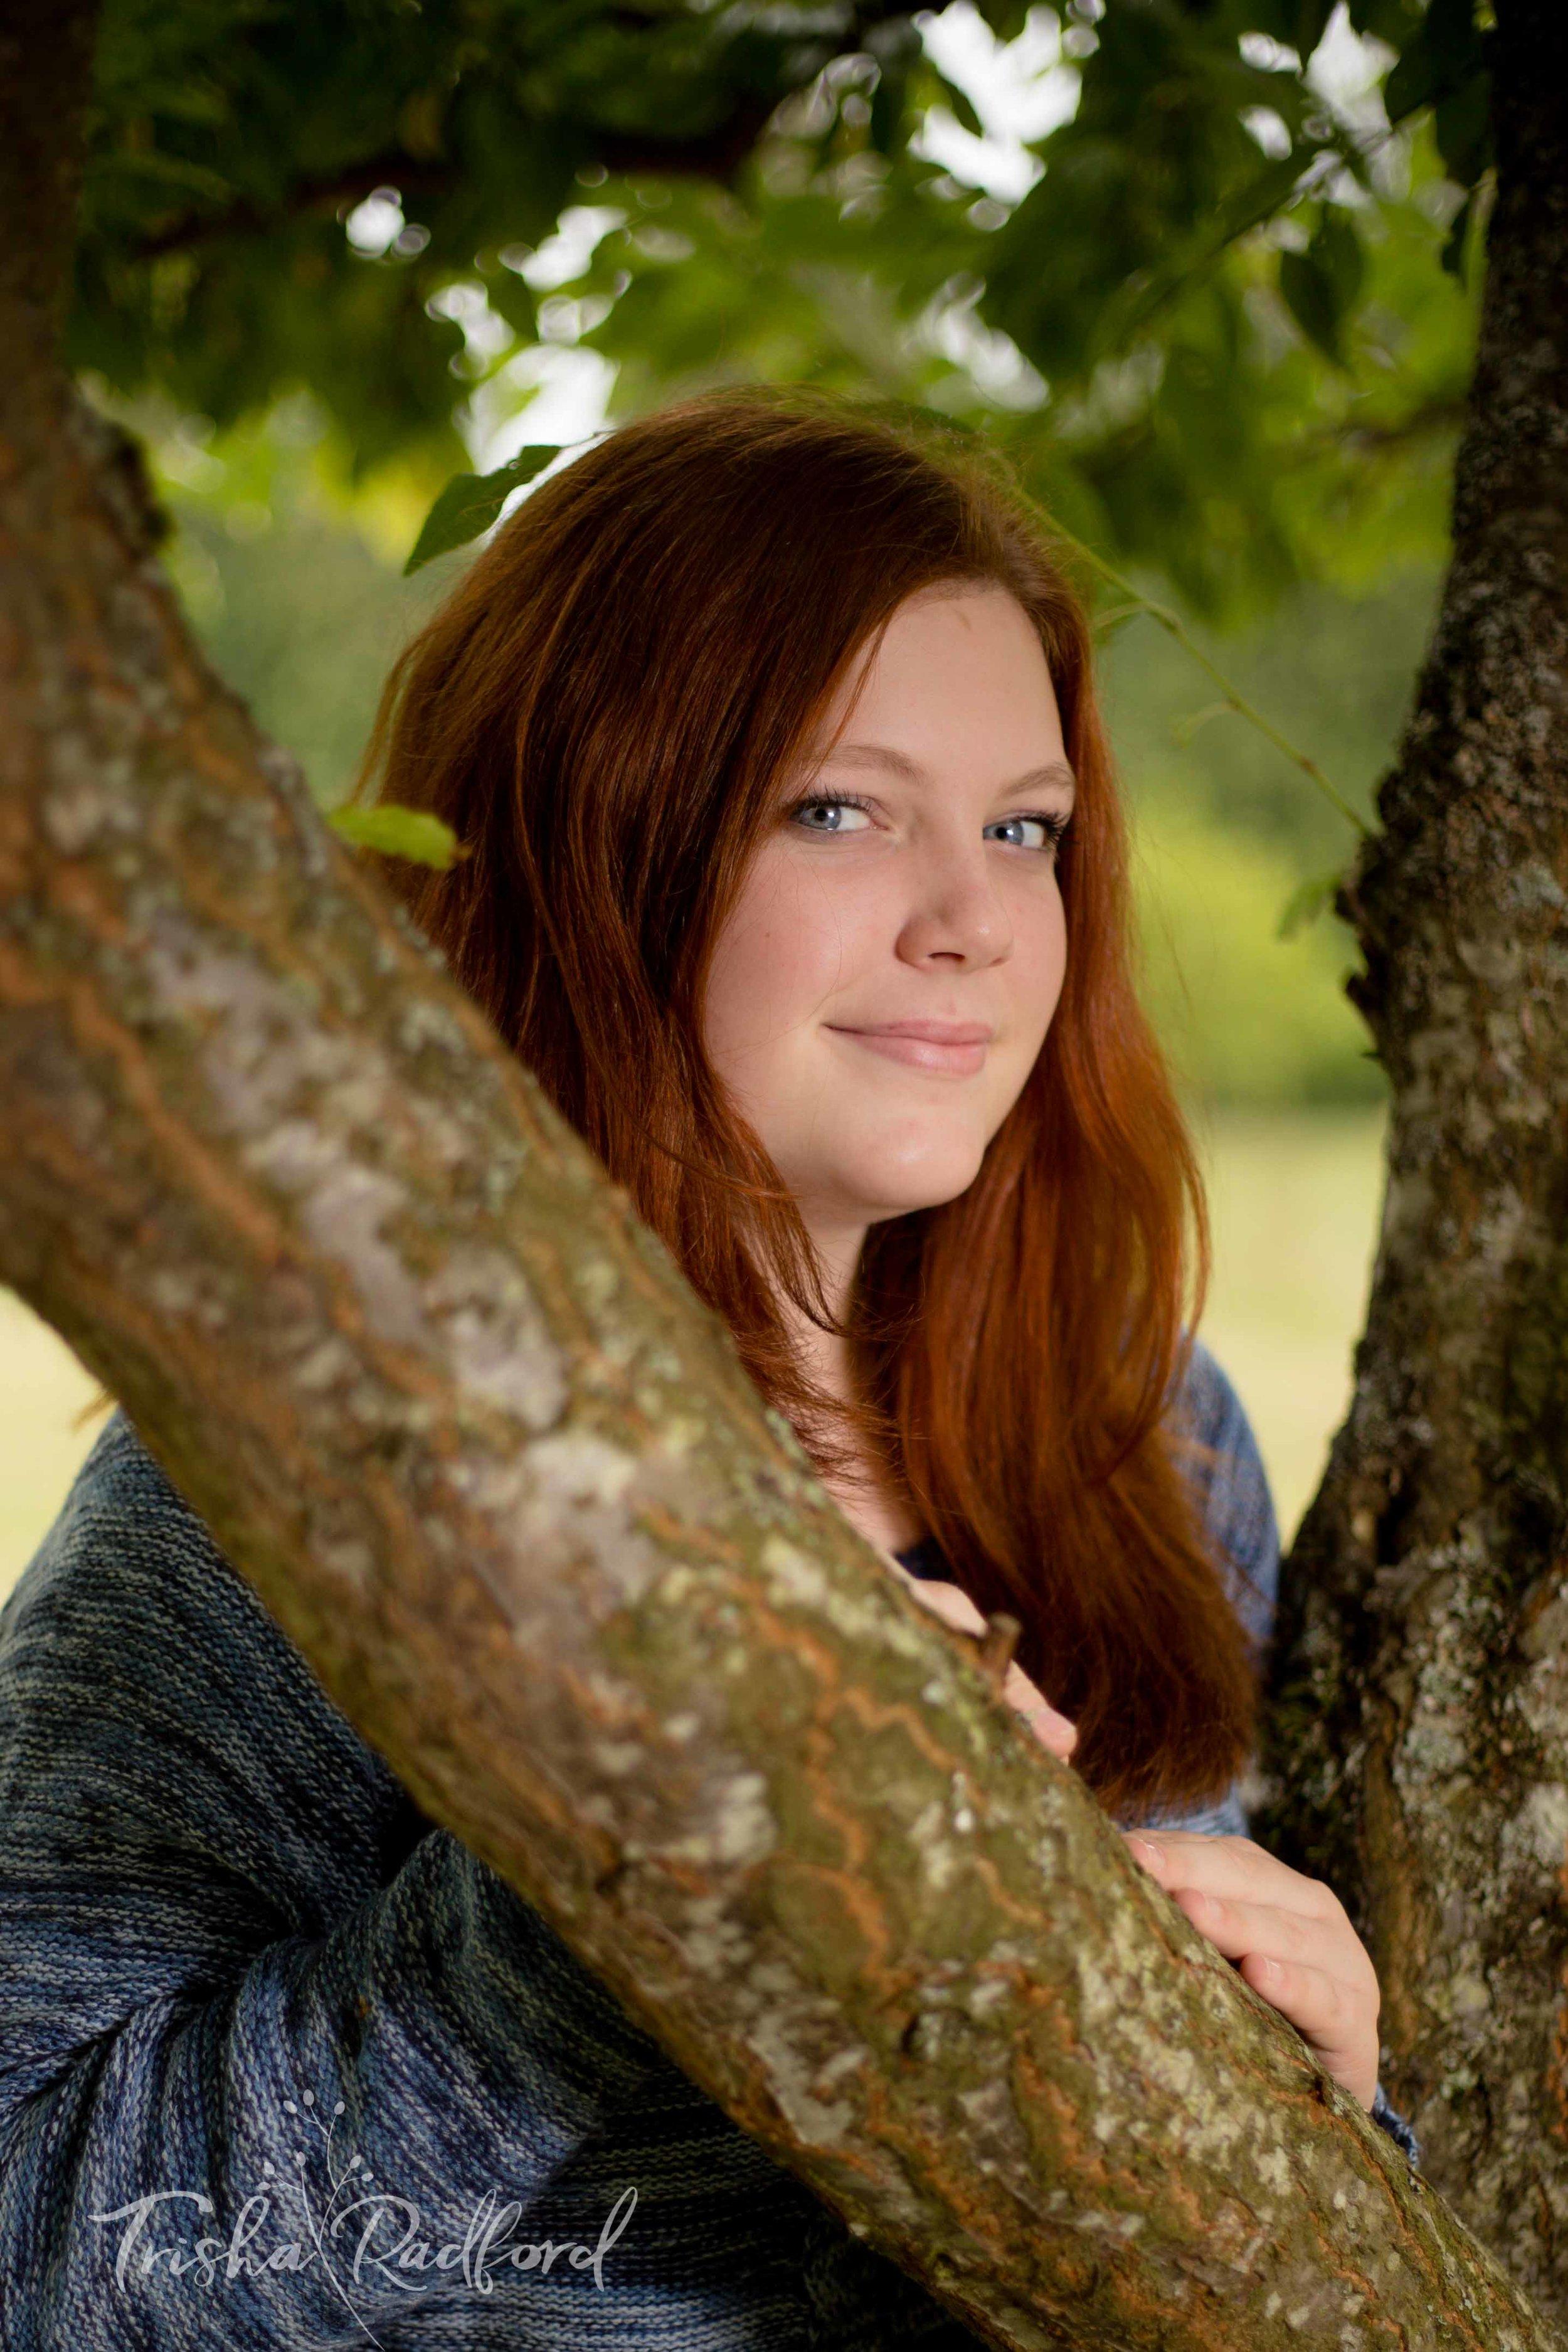 Senior Portrait Photographer - Snohomish County